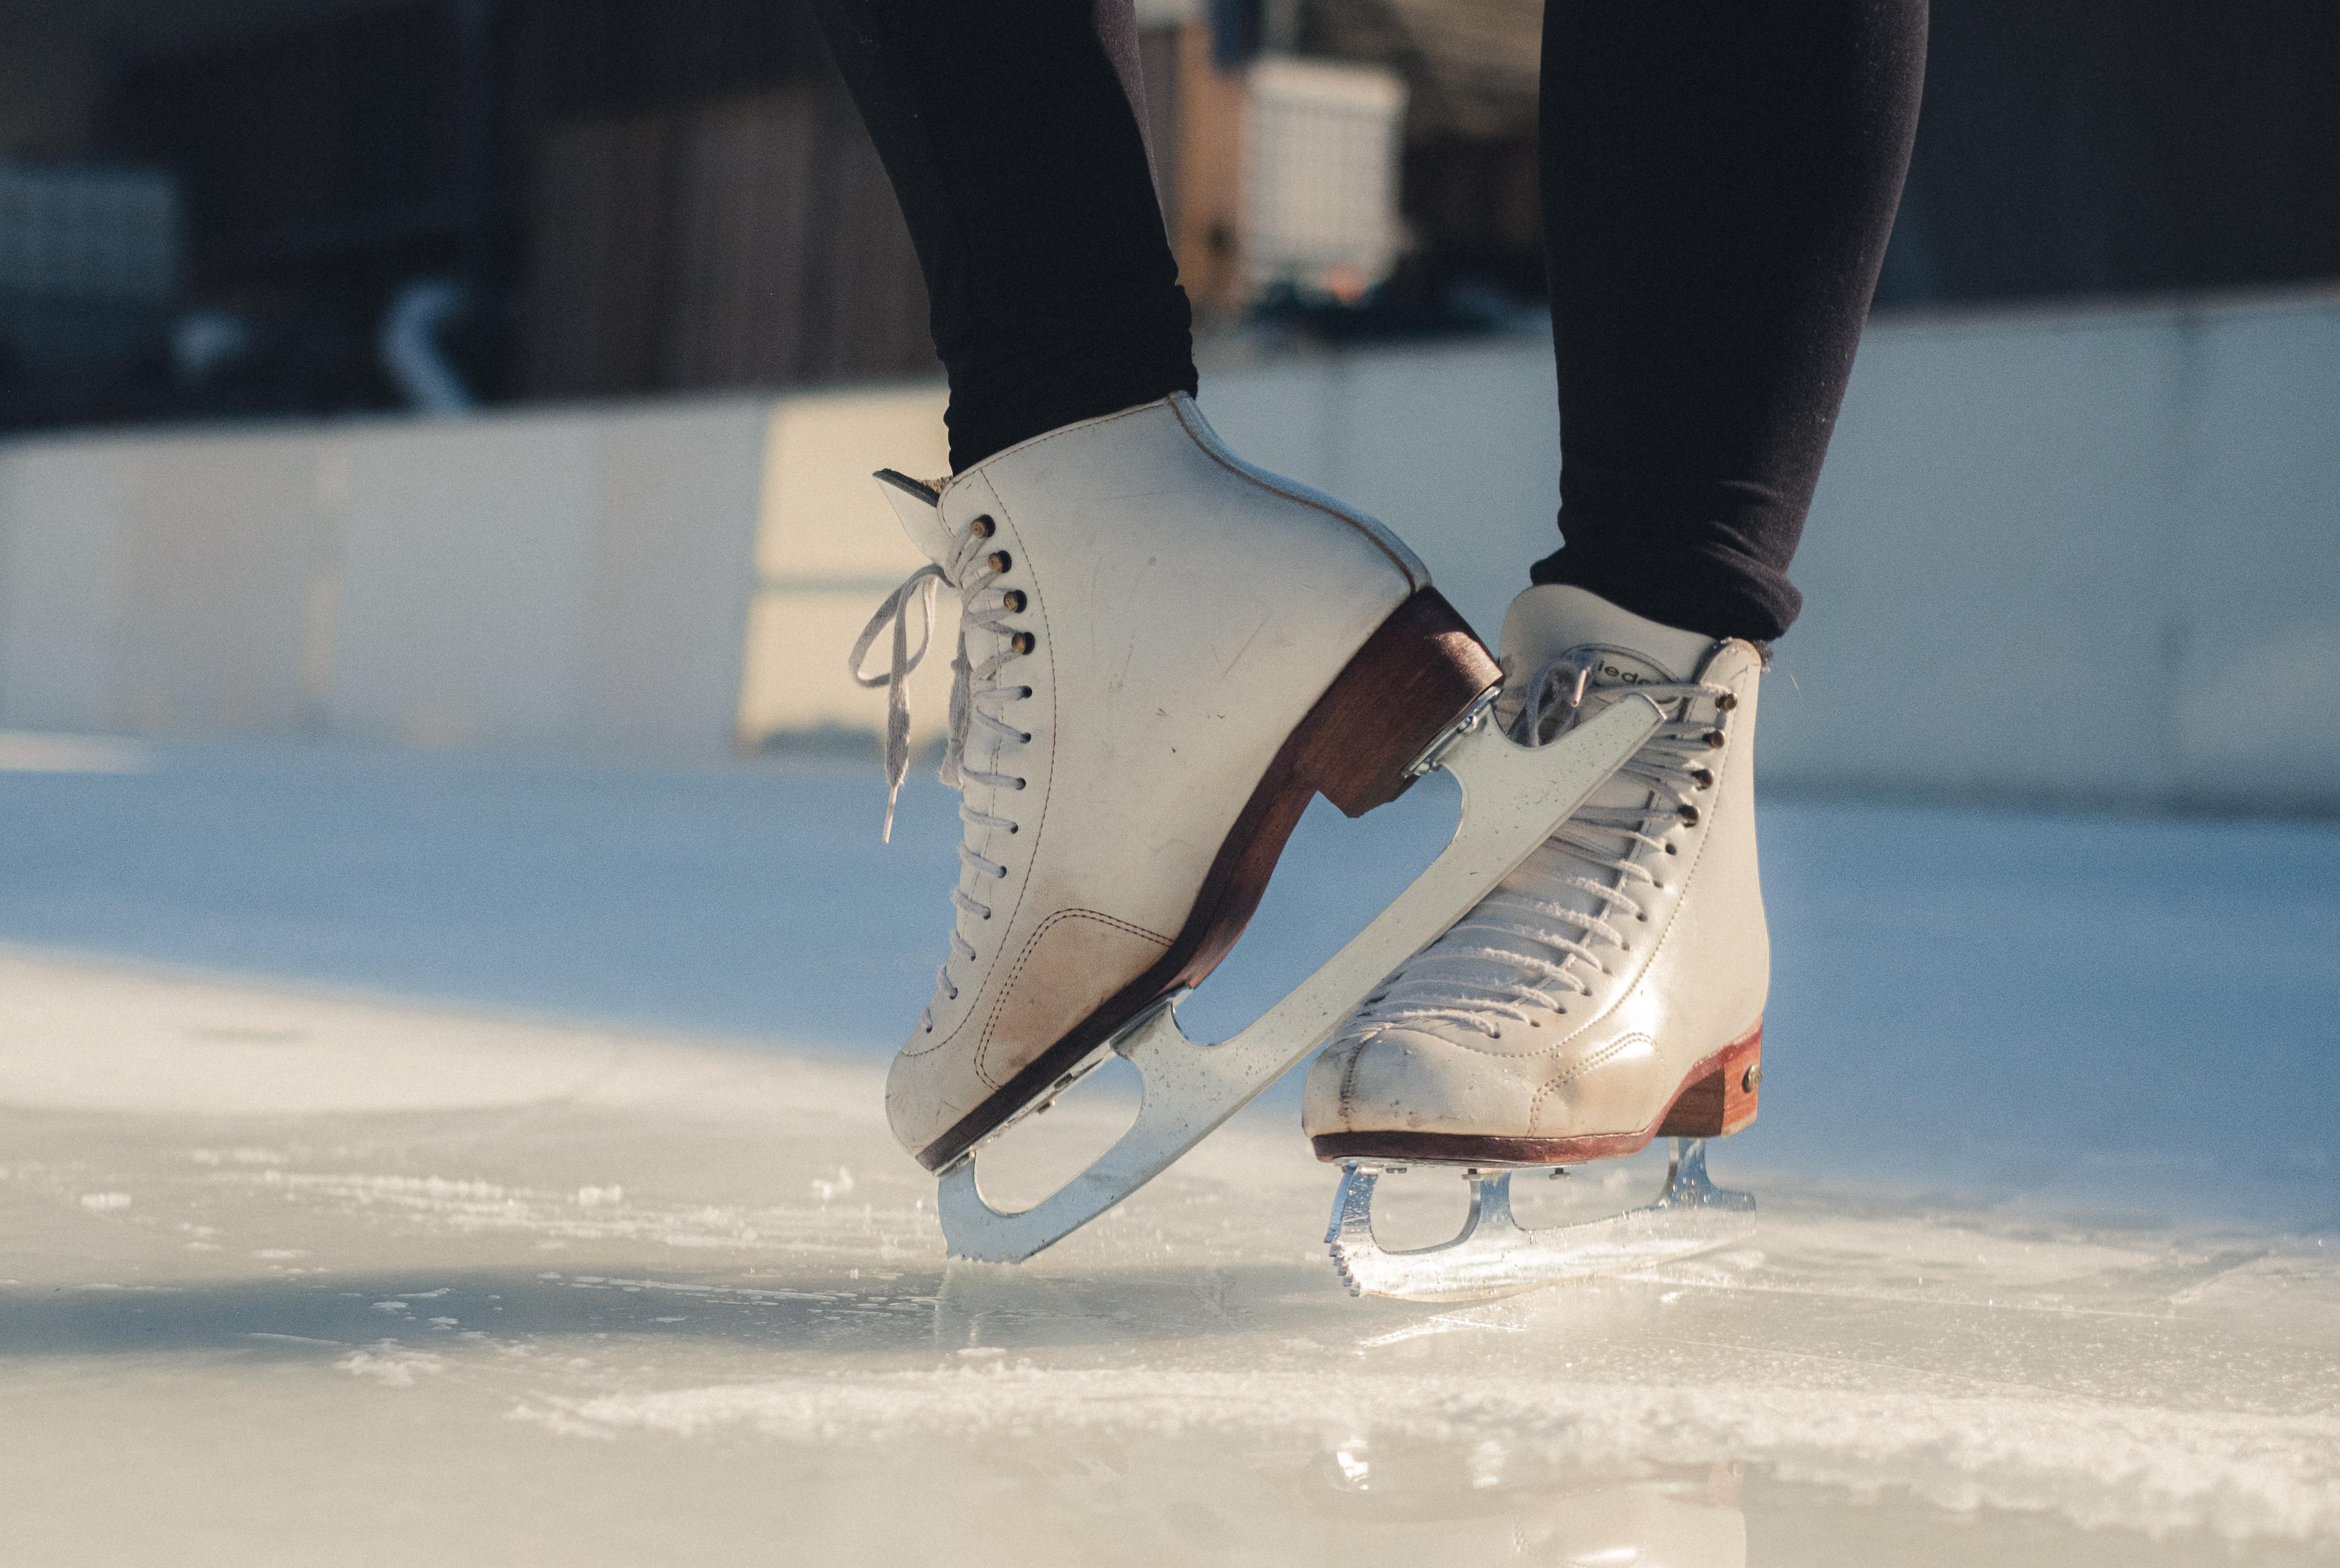 Weekend Skate Session Sign ups